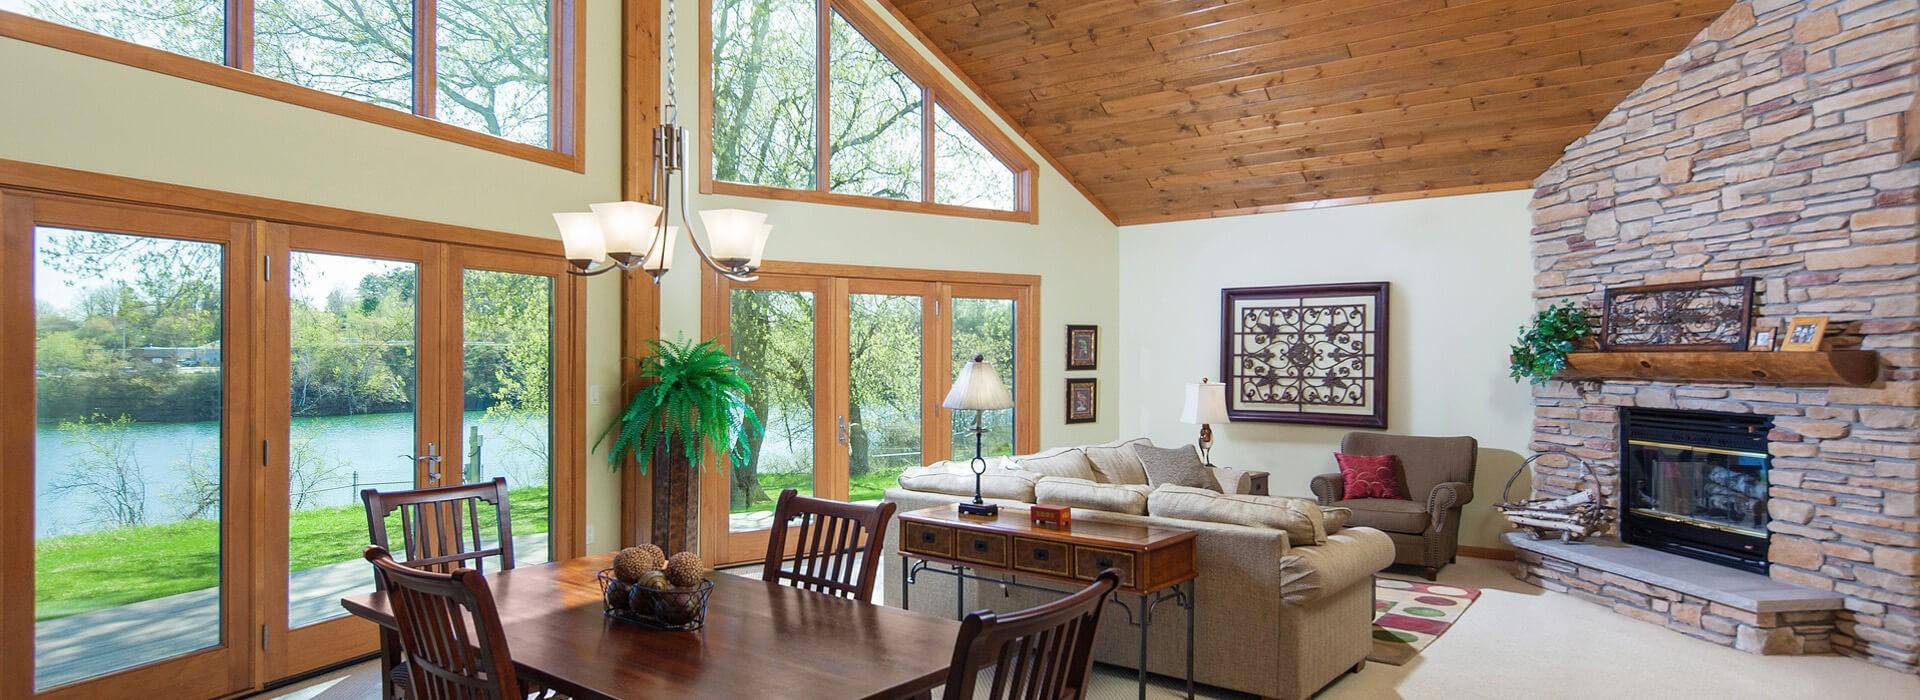 triple wide modular homes  Shop New Modular Triple Wide Homes | ModularHomes